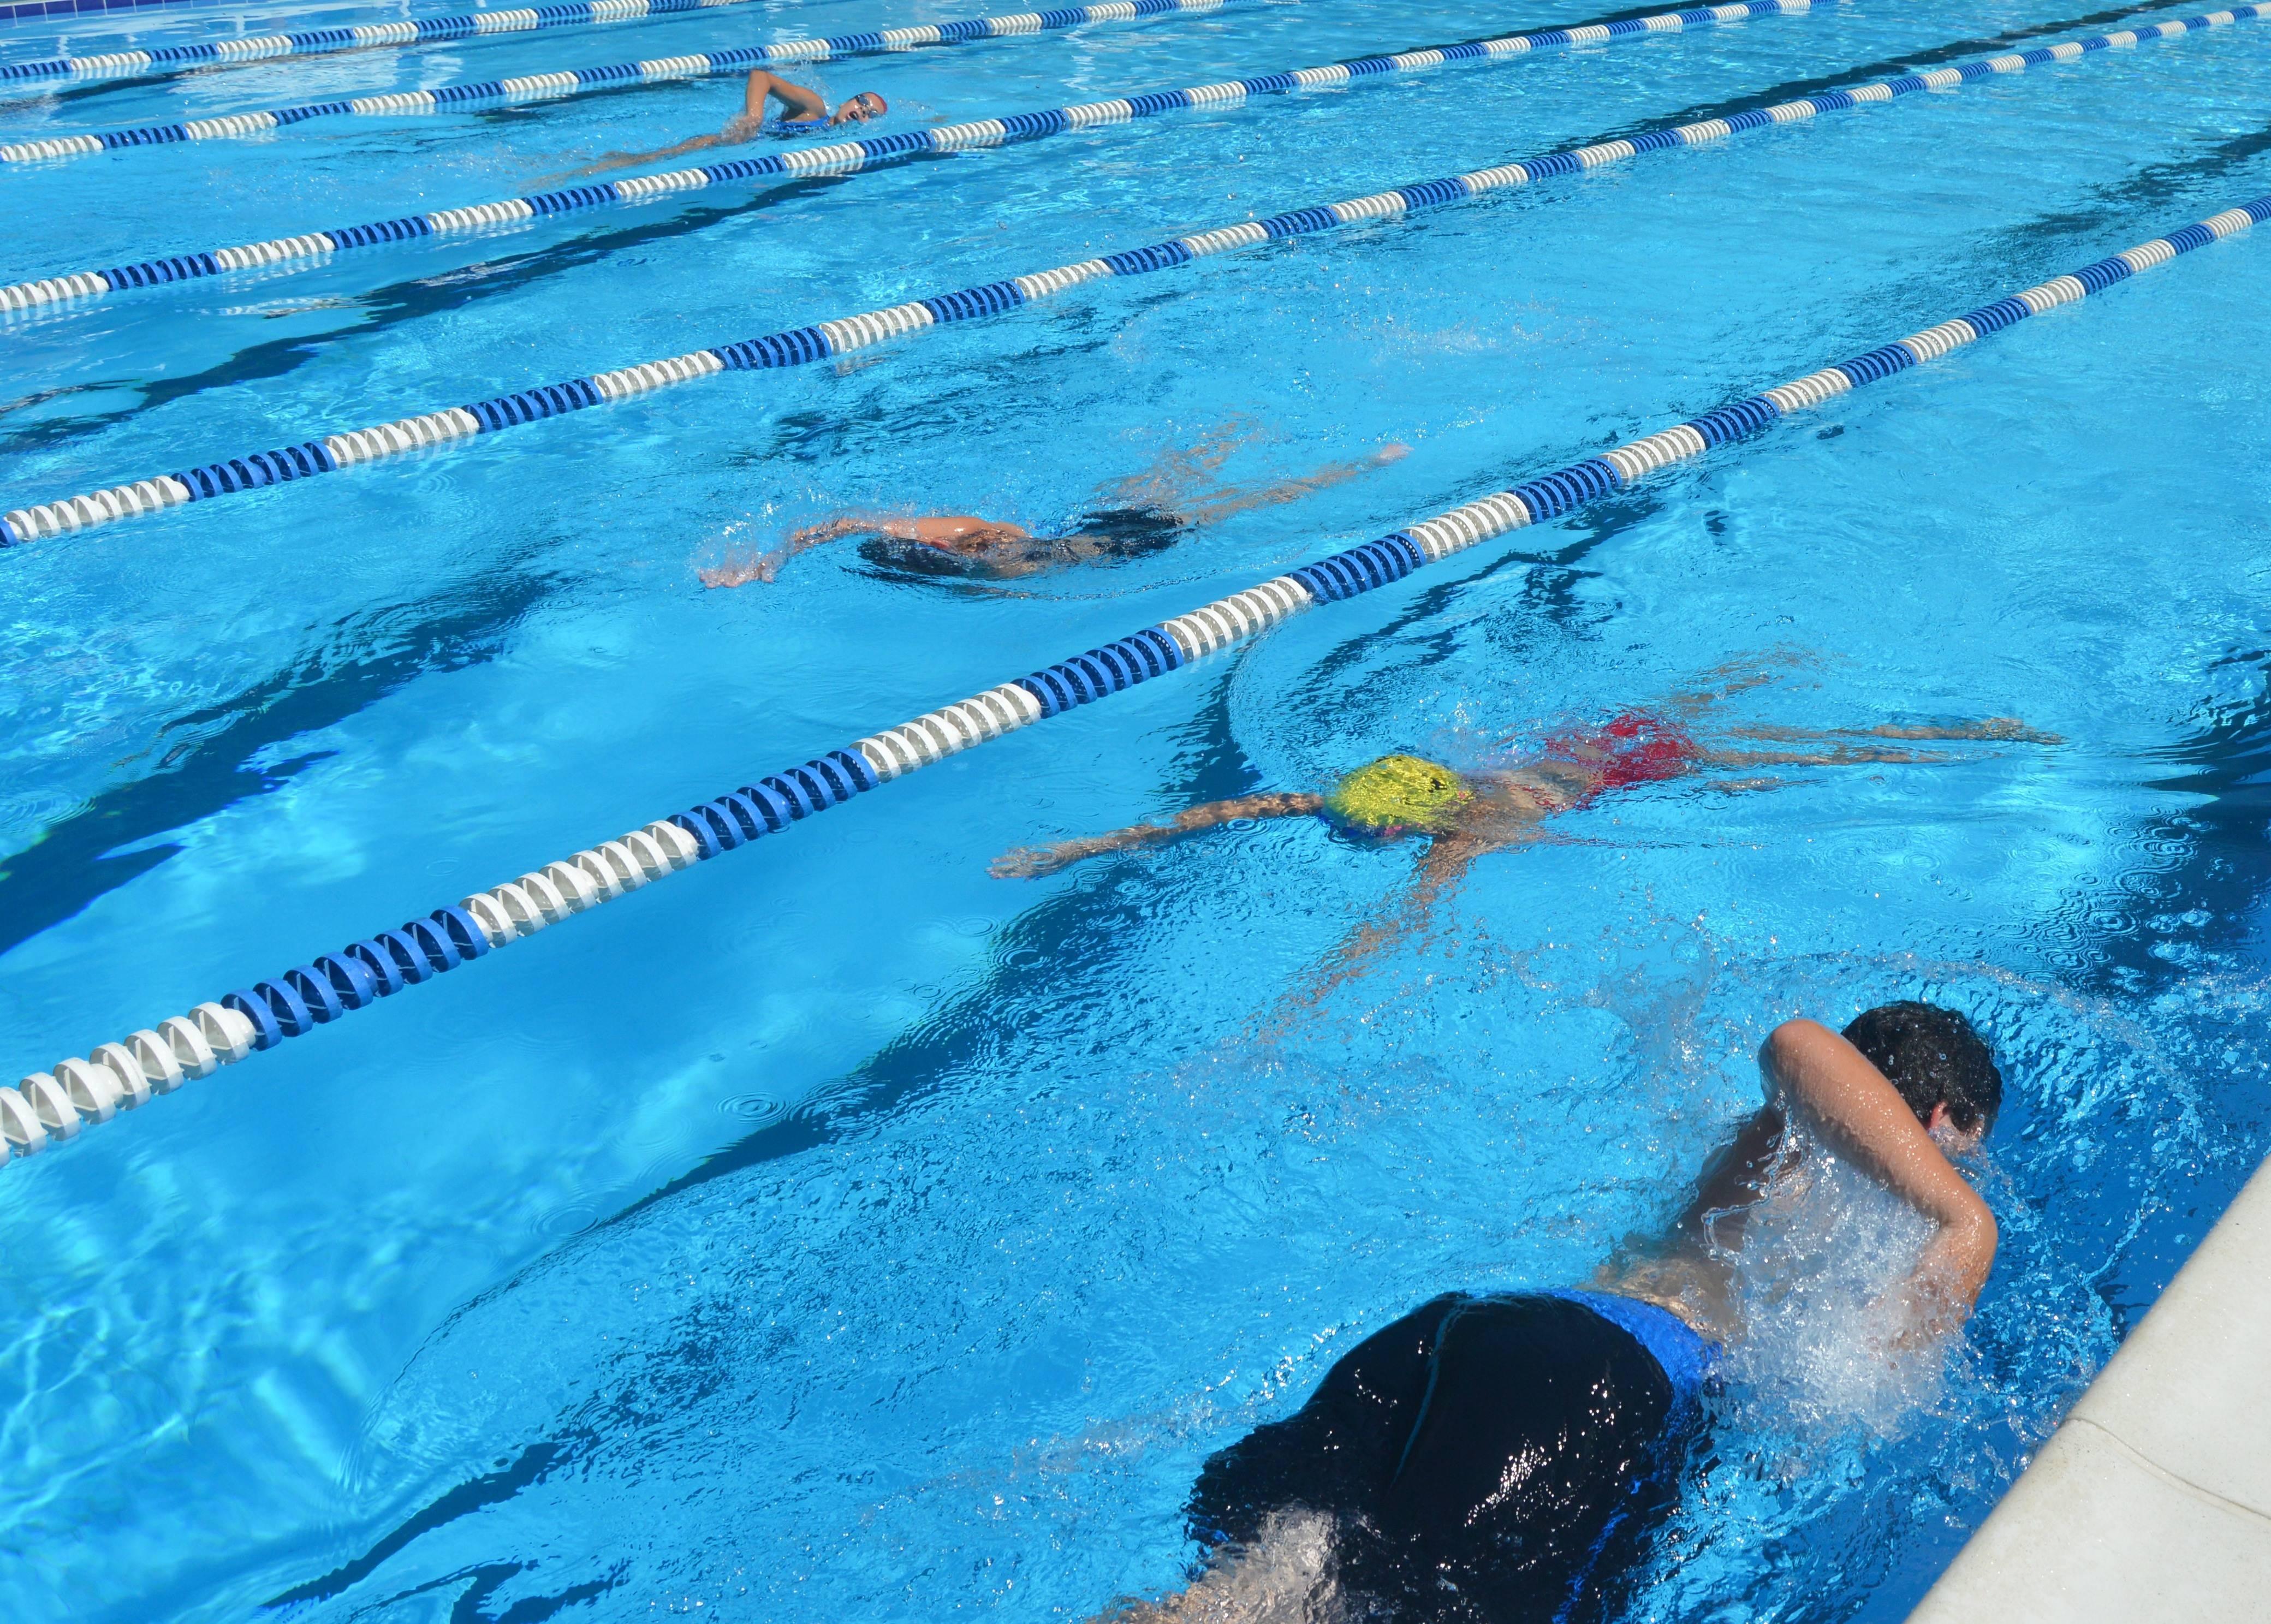 e7f536b6a6ef324691b9_Swim-a-palooza_swimmers_in_lanes.JPG